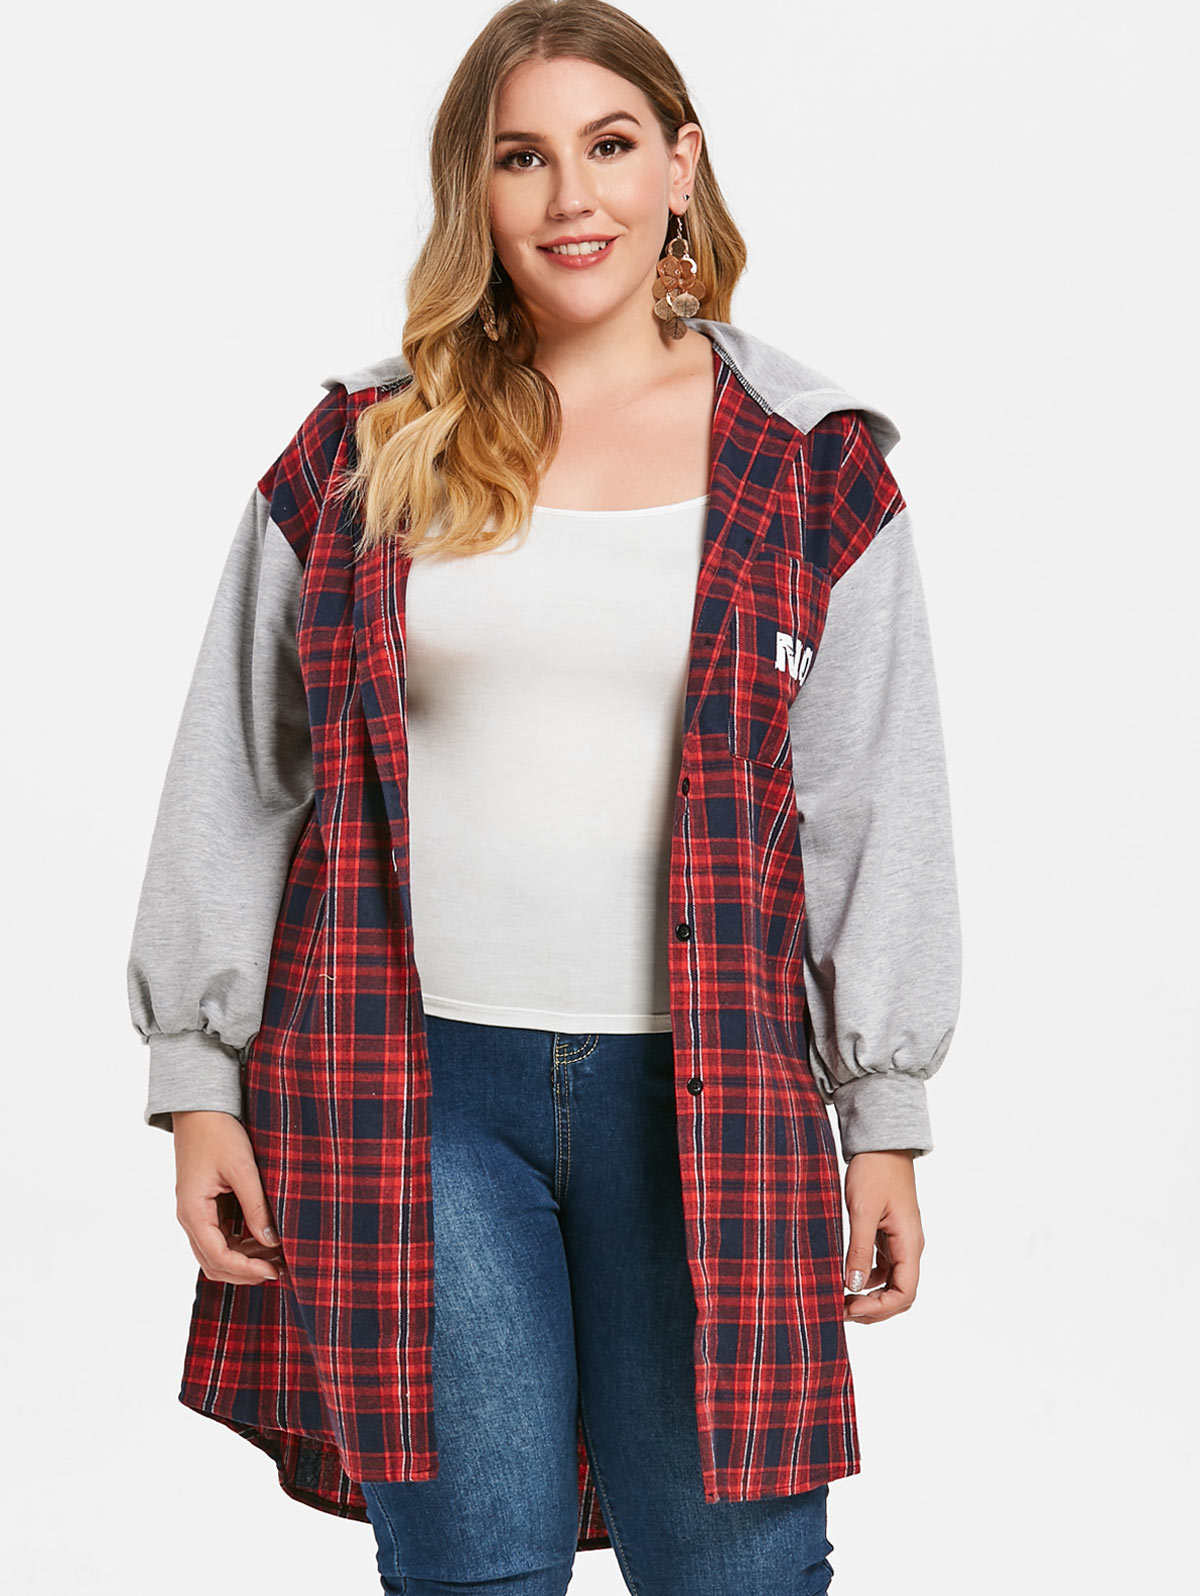 2018 Autumn Winter Coat Women Jacket Plus Size Ladies Women Jacket Hat Casual Coat Outwear Big Size Plaid Back Printed Coats